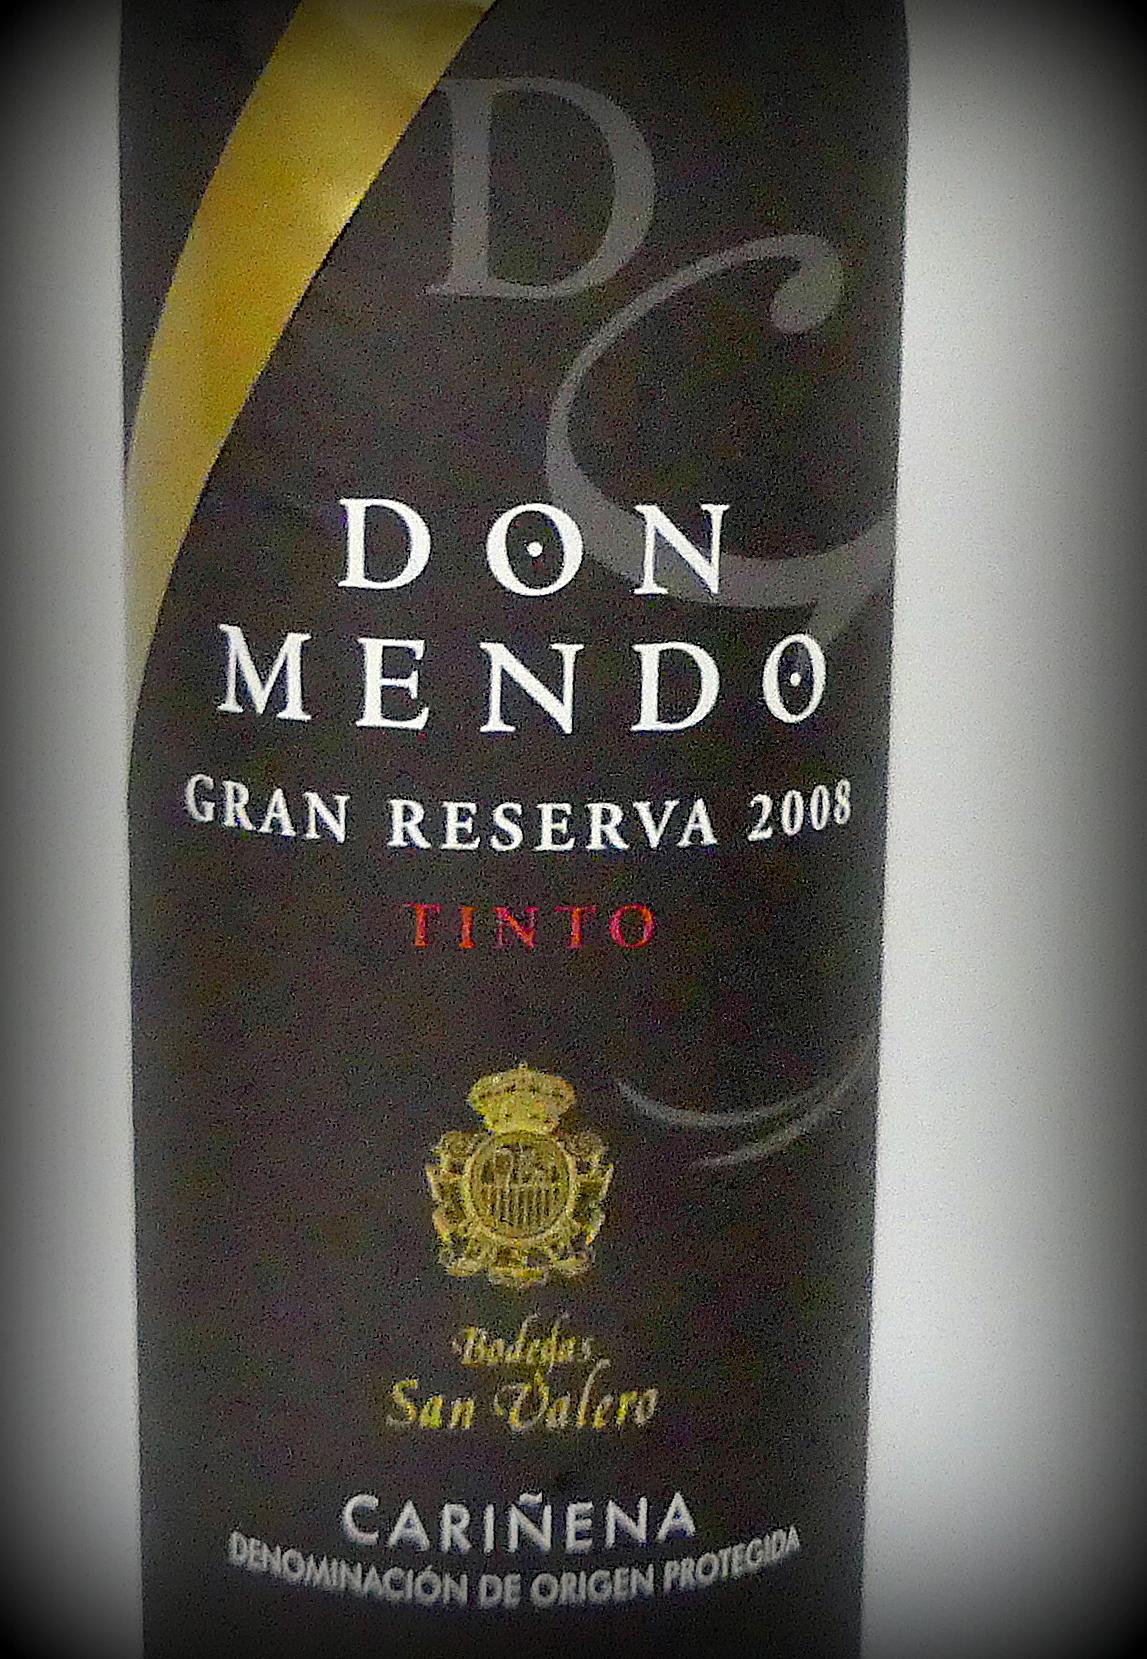 Don Mendo Gran Reserva